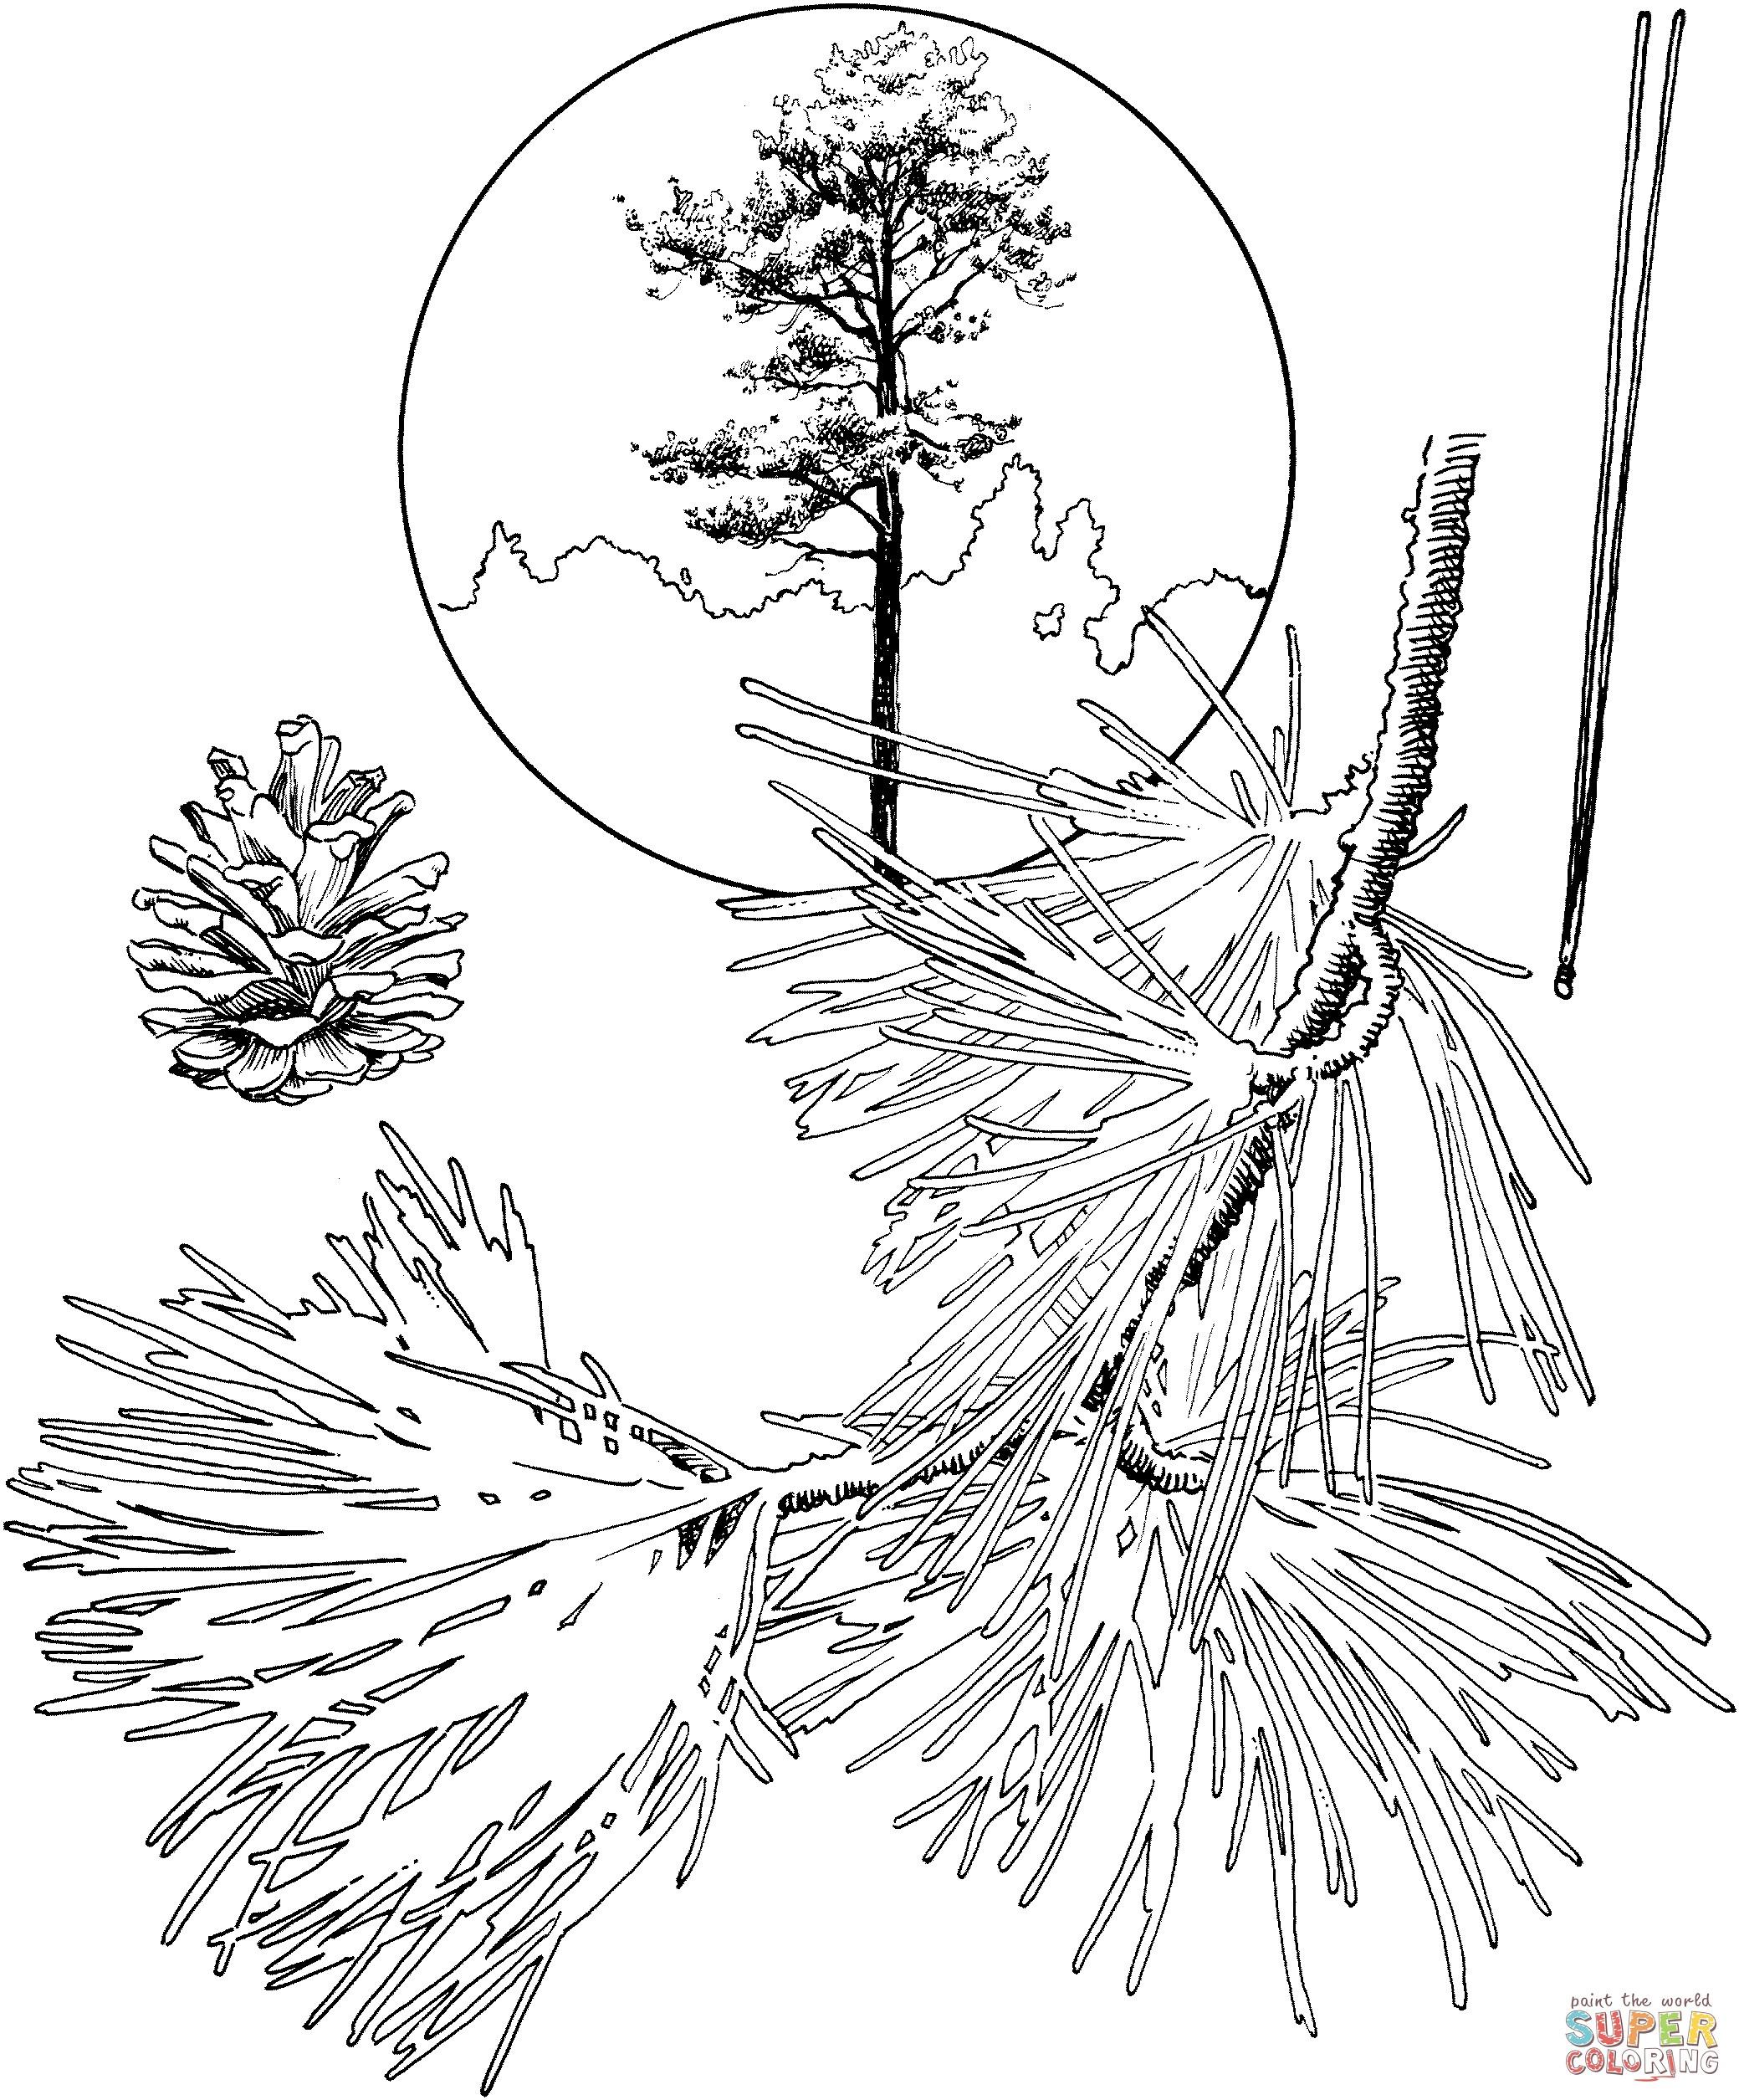 Pine Trees In Pencil Drawing At Getdrawings